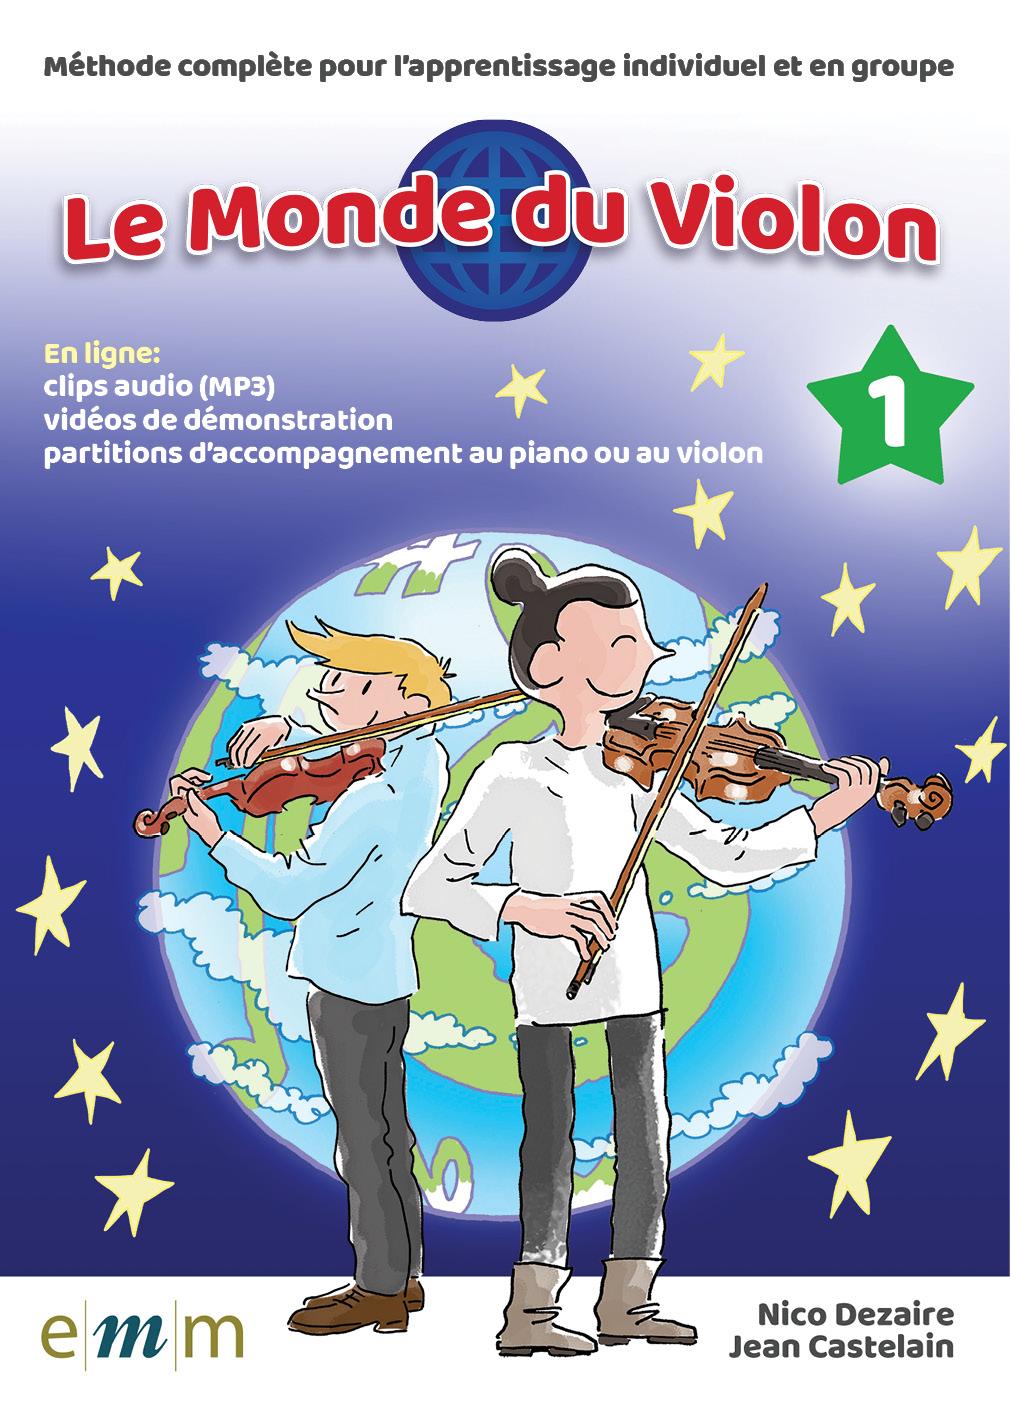 Je bekijkt nu 10_4 Brioch' chaude (2) – DÉMO Violon 1 FR